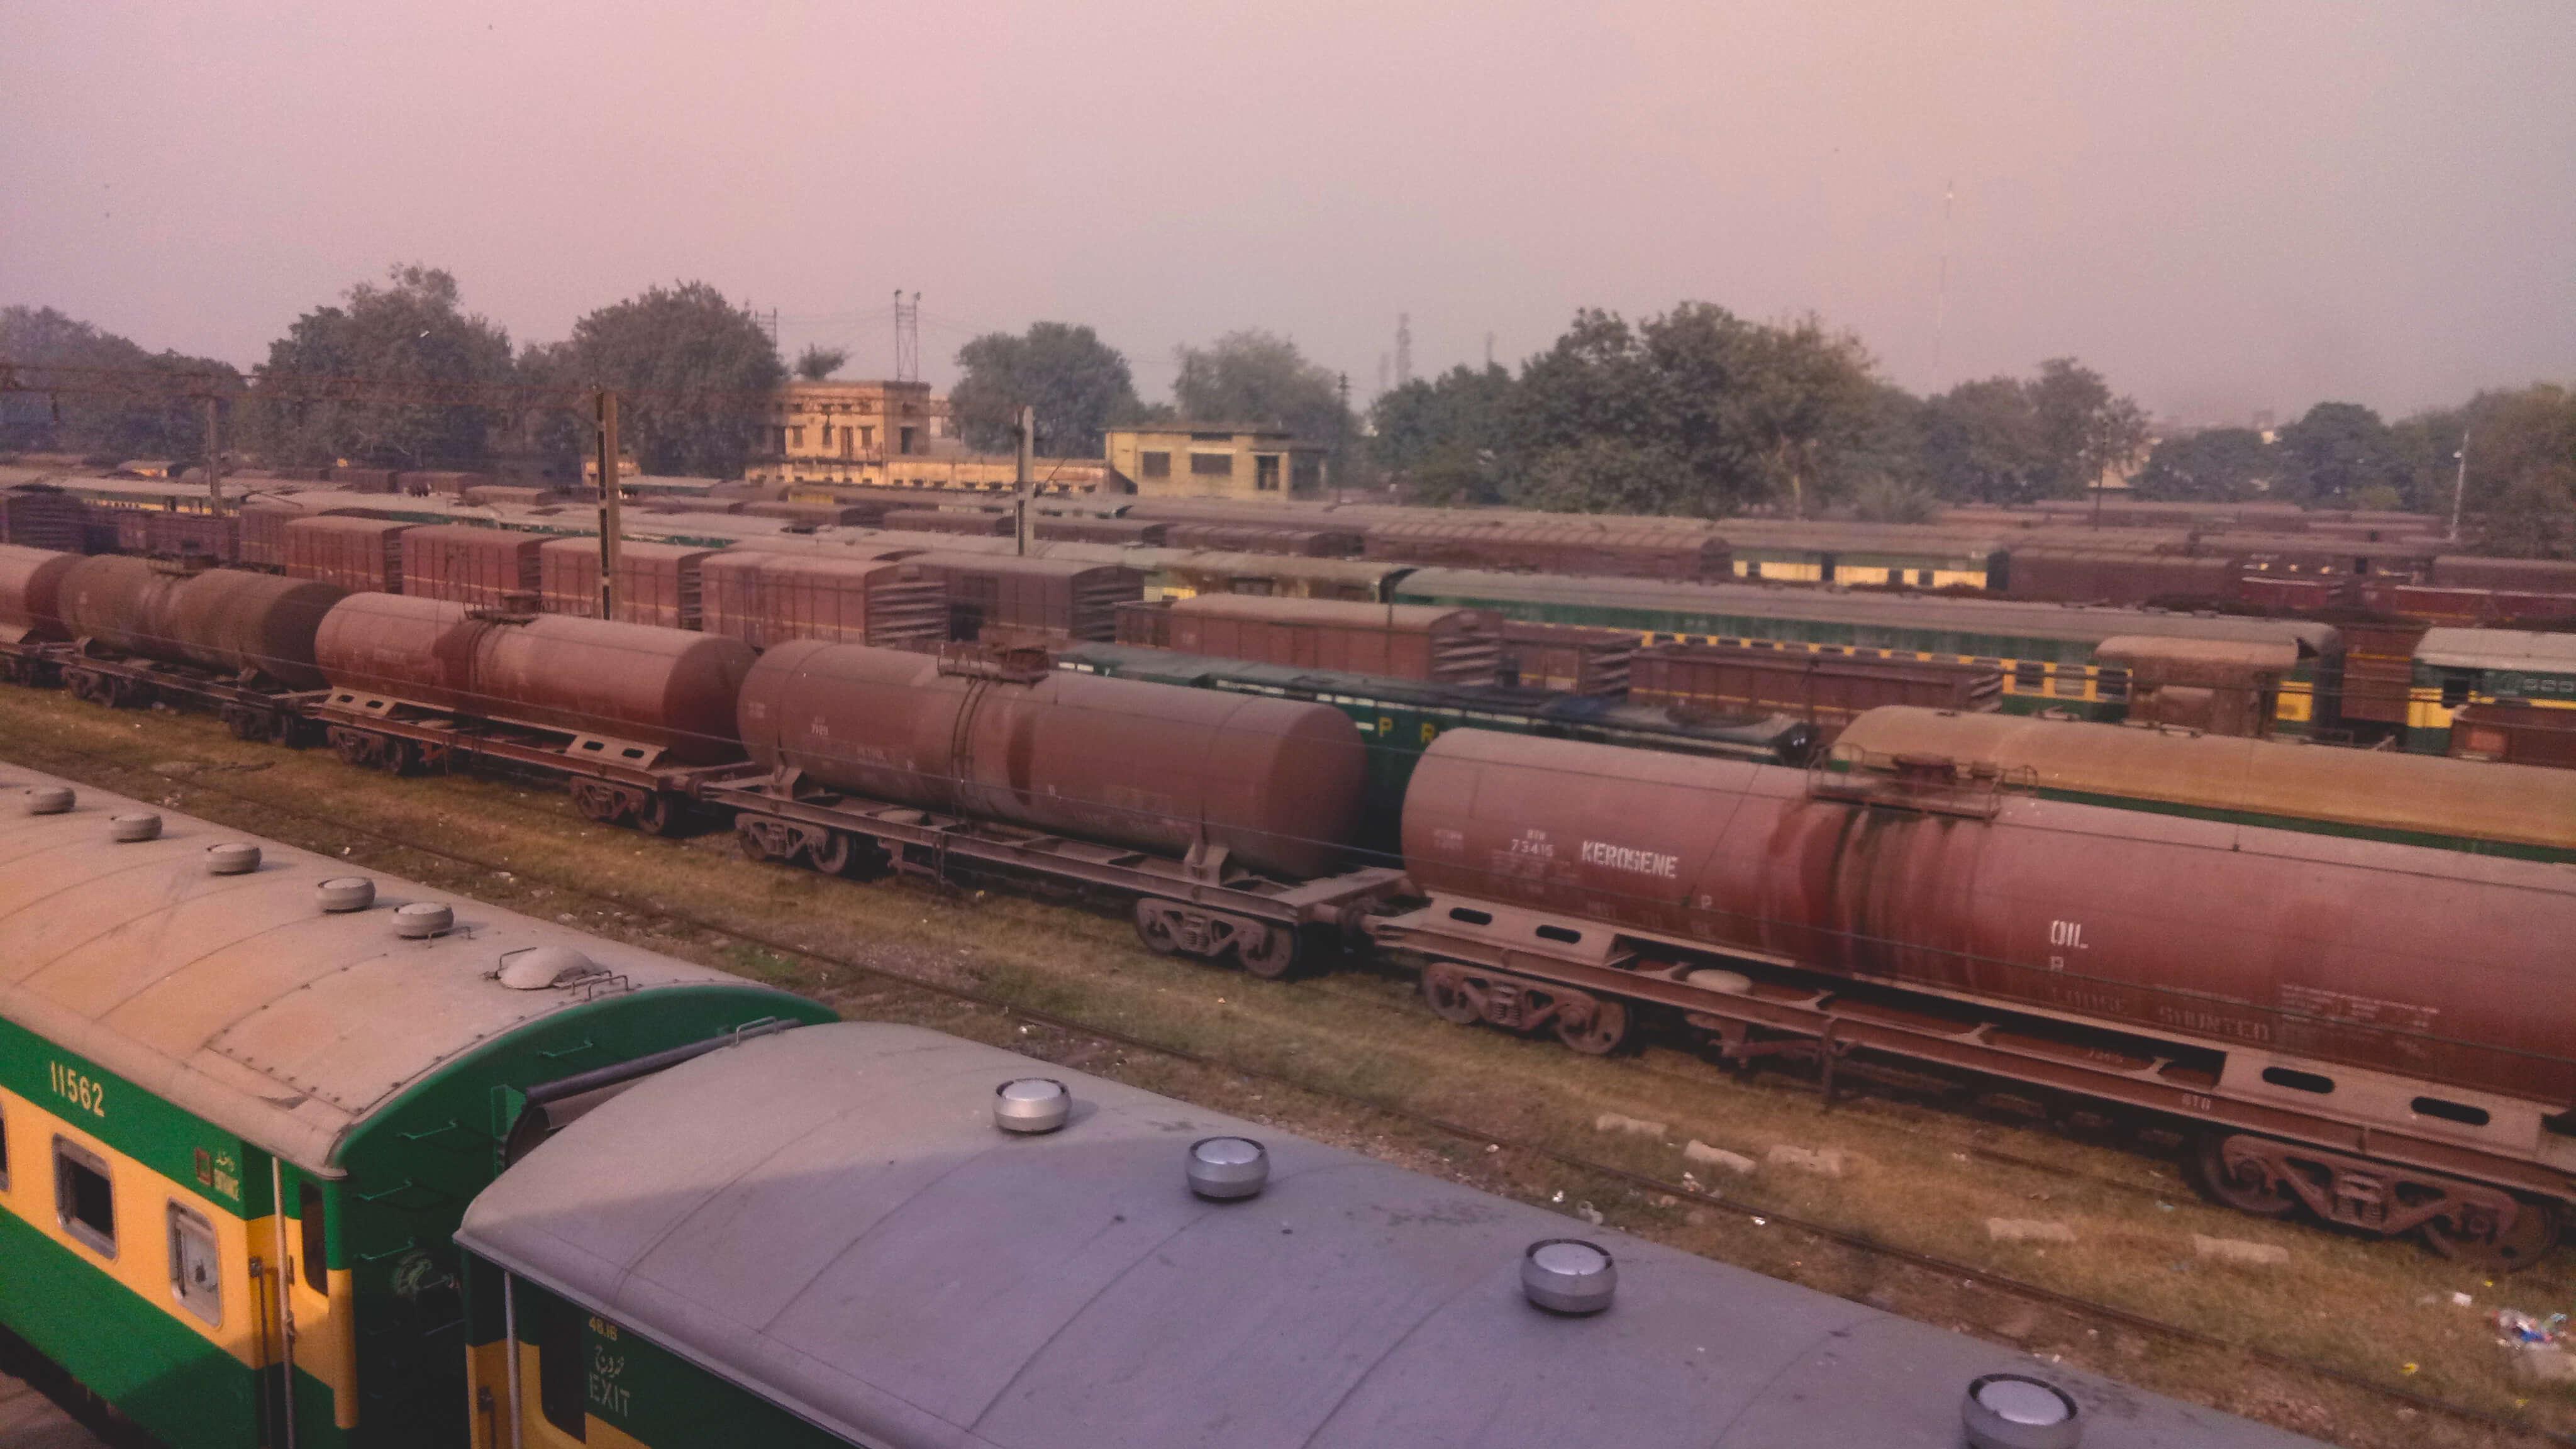 Edited 1 1 - Lahore Railway Station